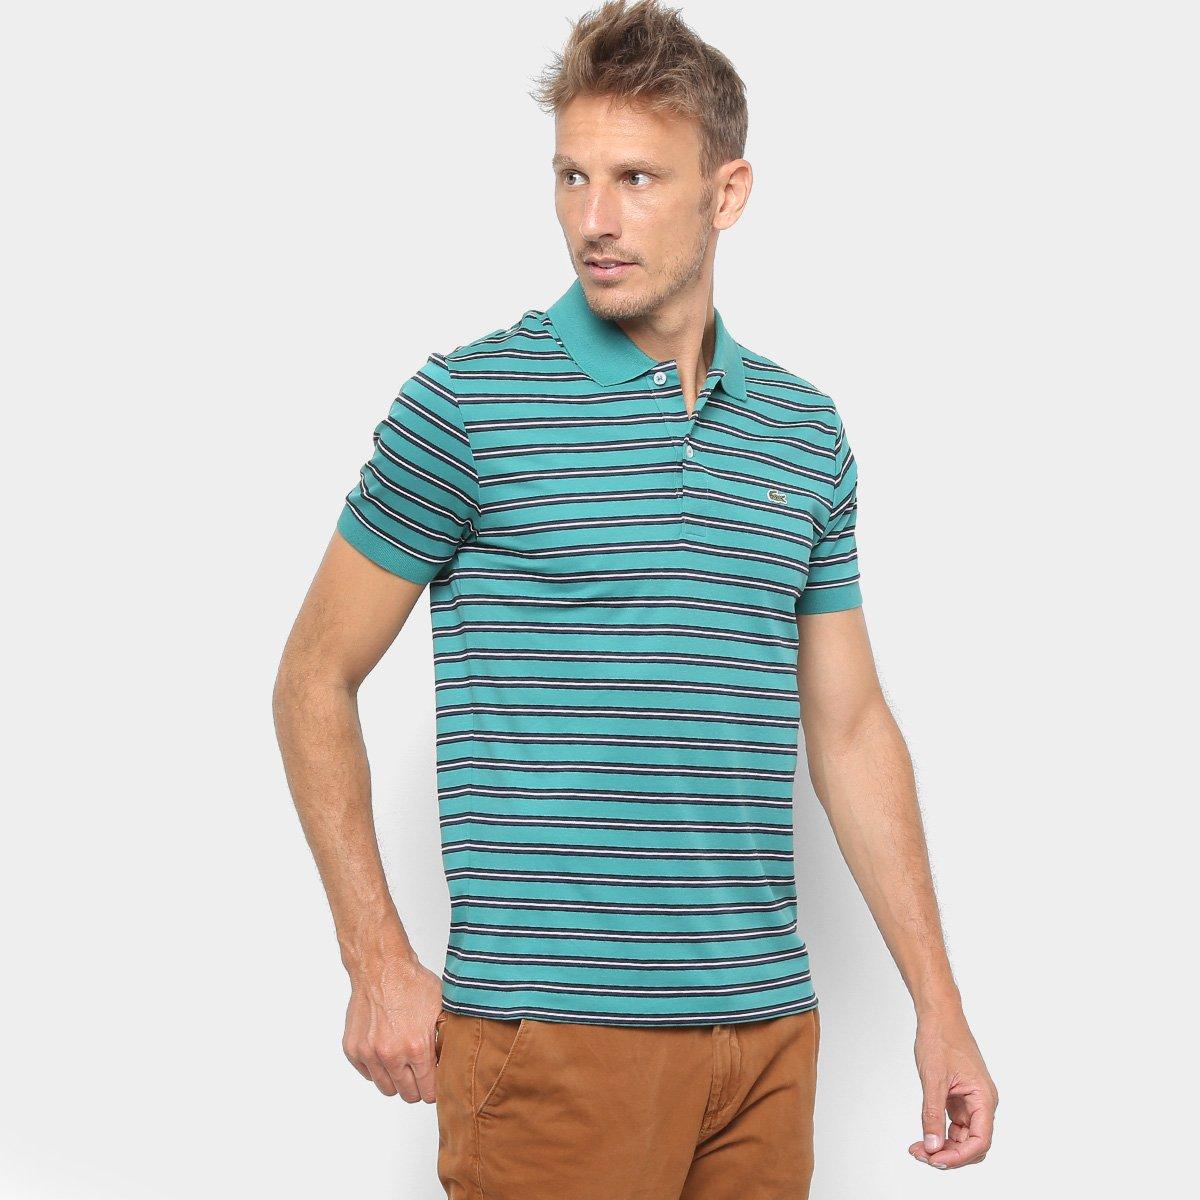 d86ee778c Camisa Polo Lacoste Listrada Masculina